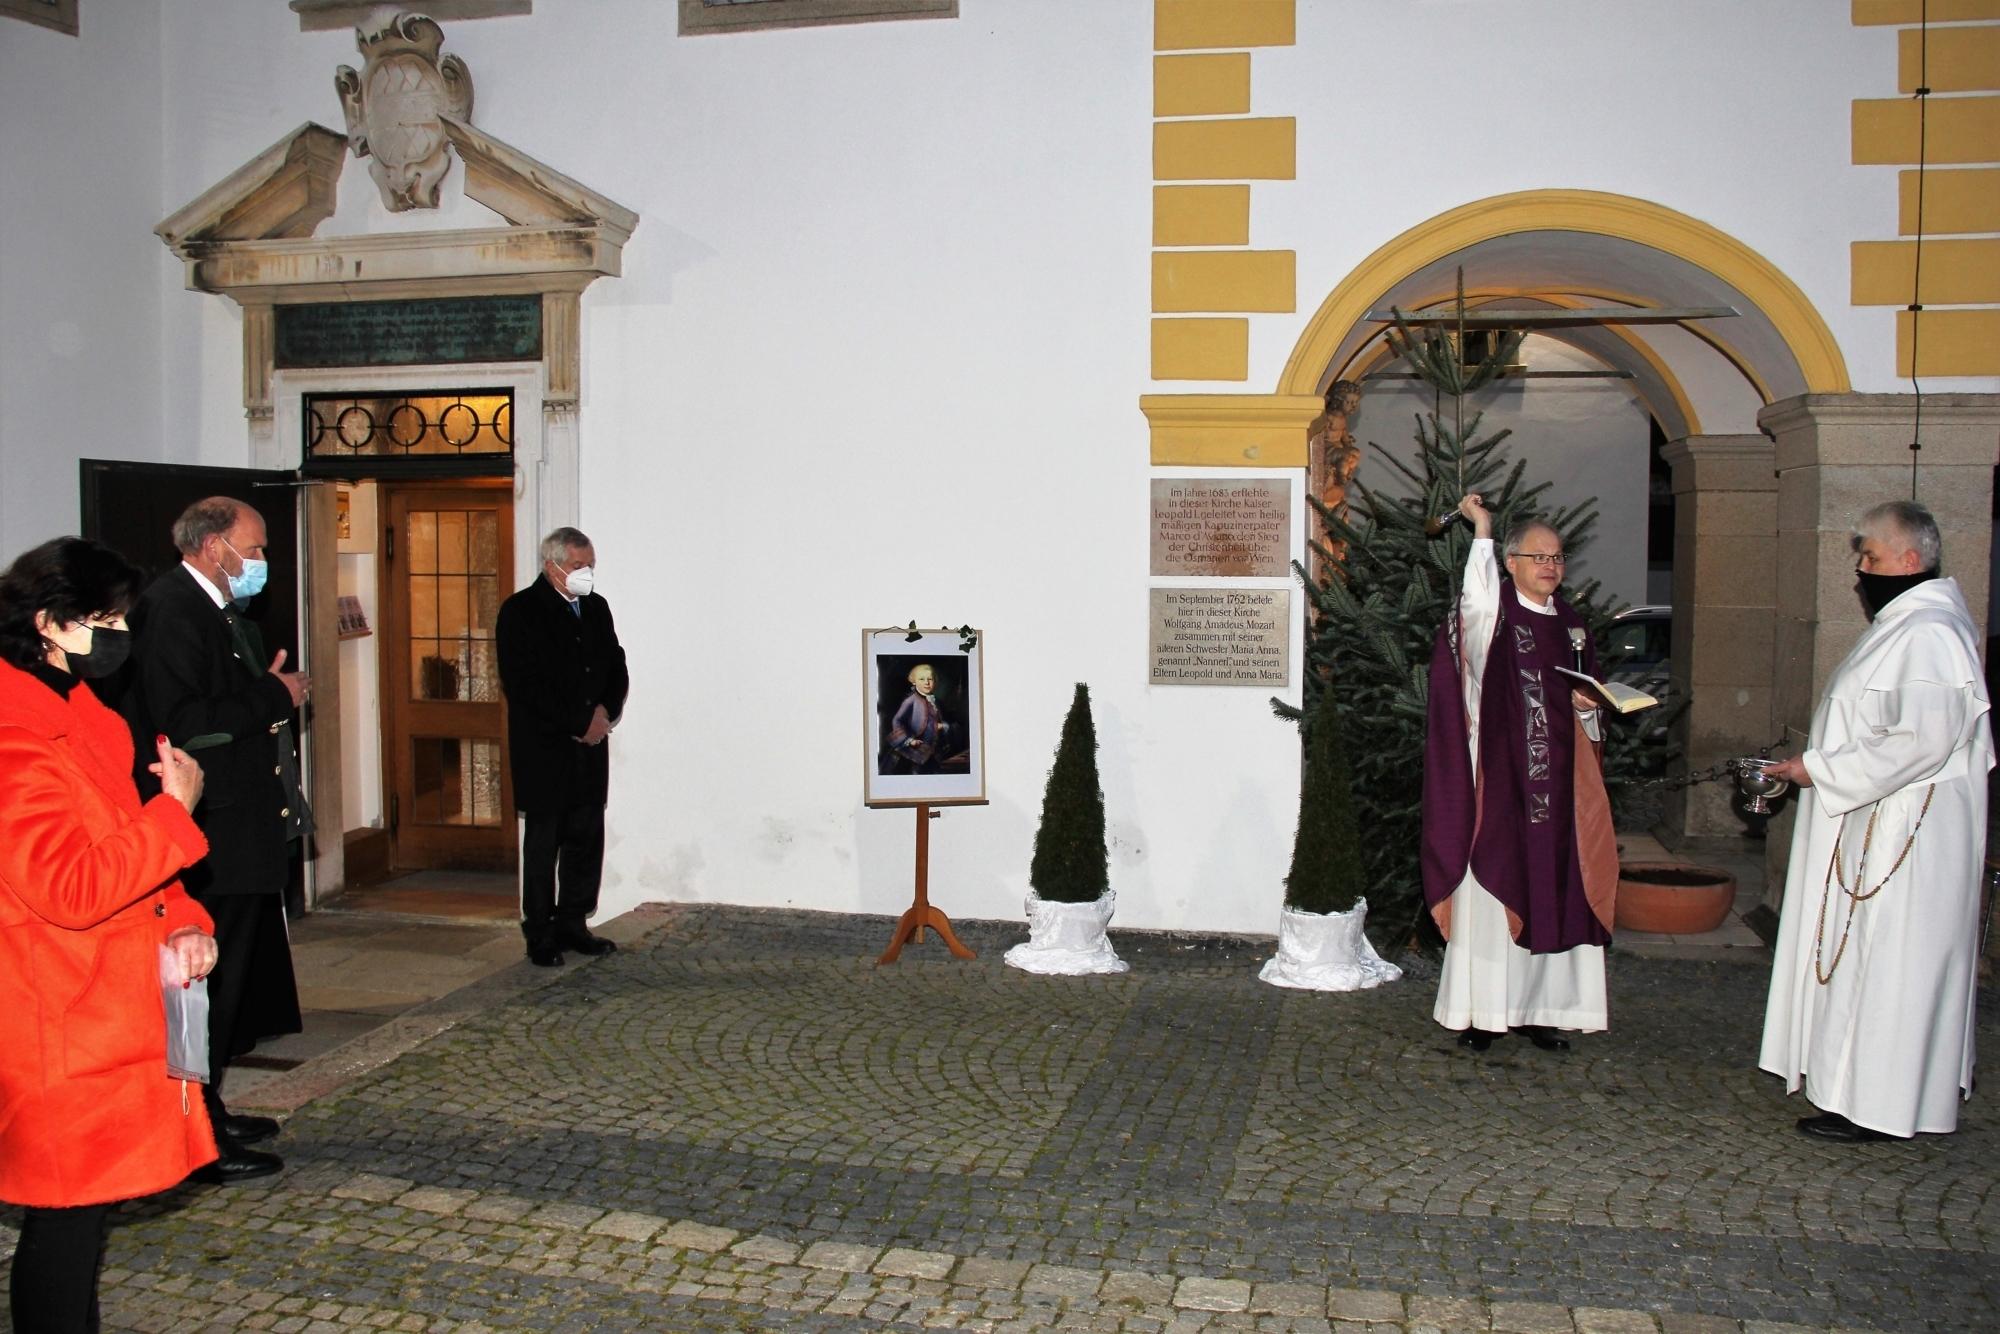 Bp Bistumsblatt Mozart Gedenktafel Enth llung PA Mariahilf Freyberg 05 12 2020 1